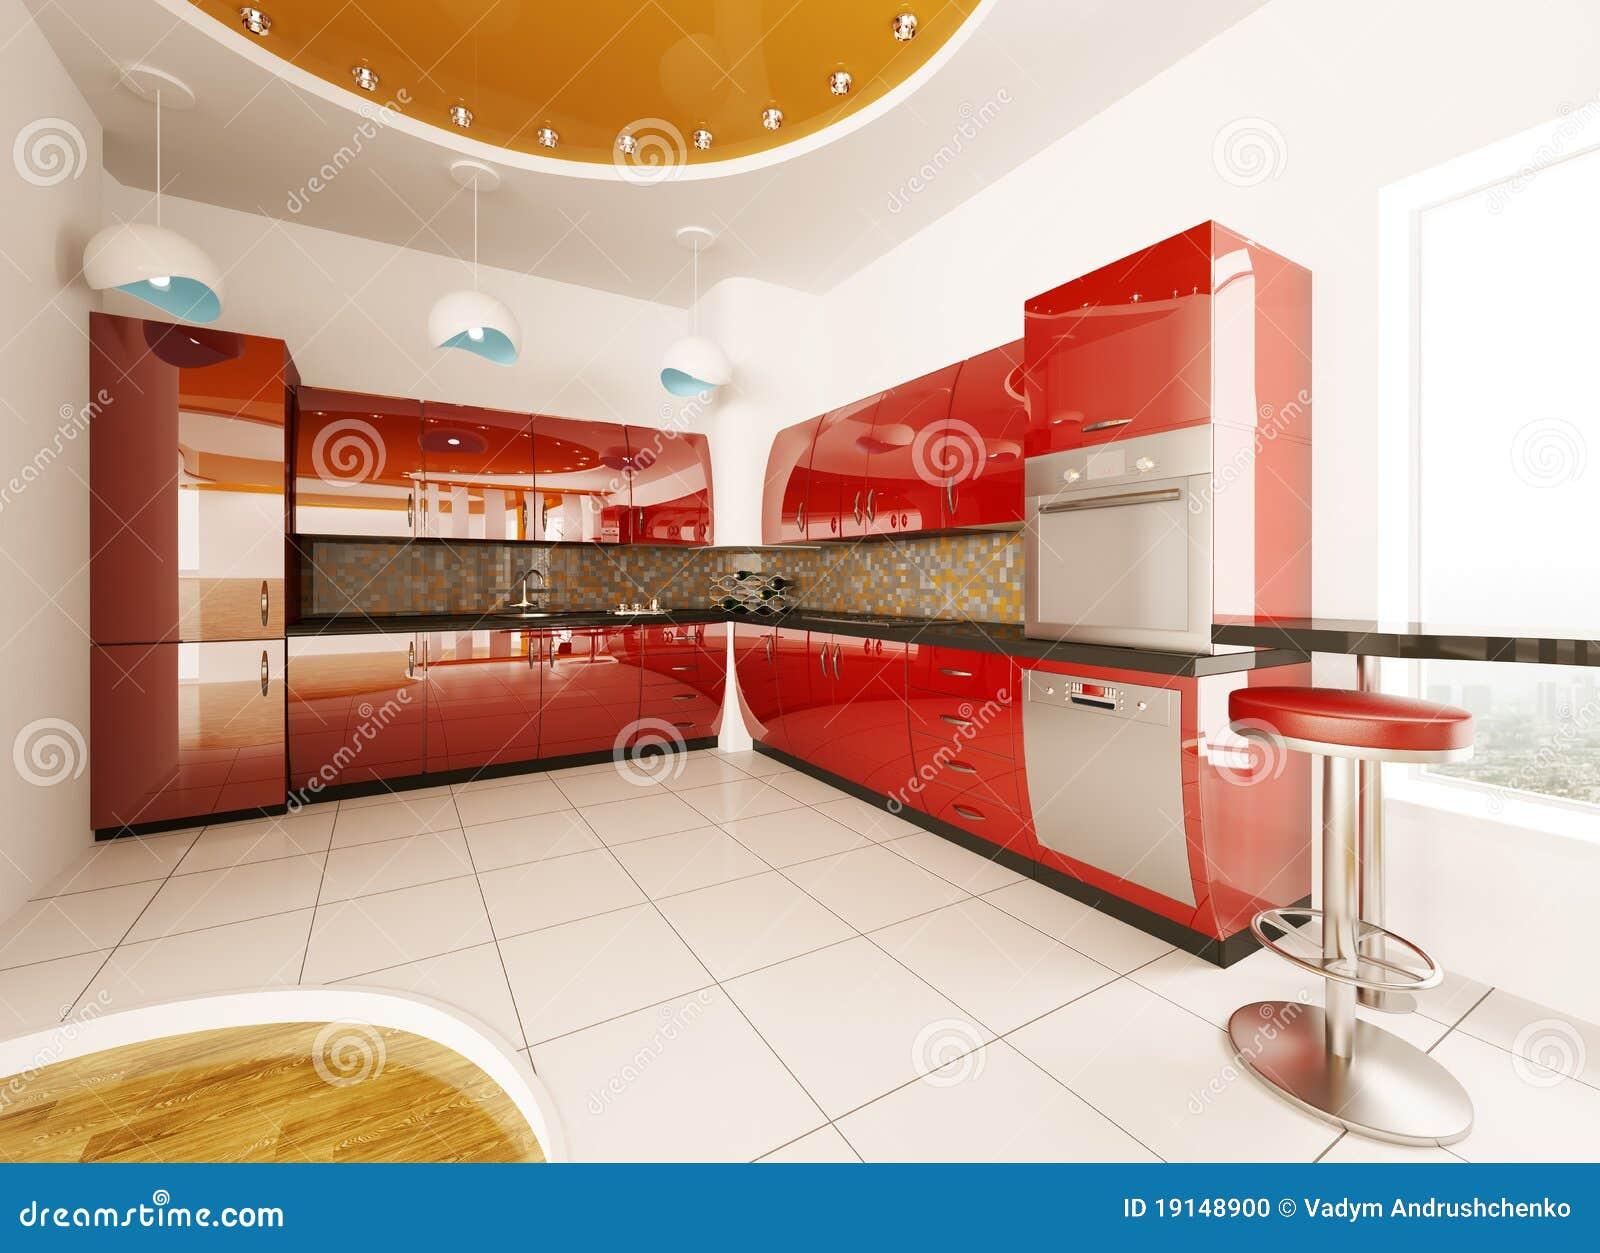 El dise o interior de la cocina moderna 3d rinde stock de for Diseno interior cocina